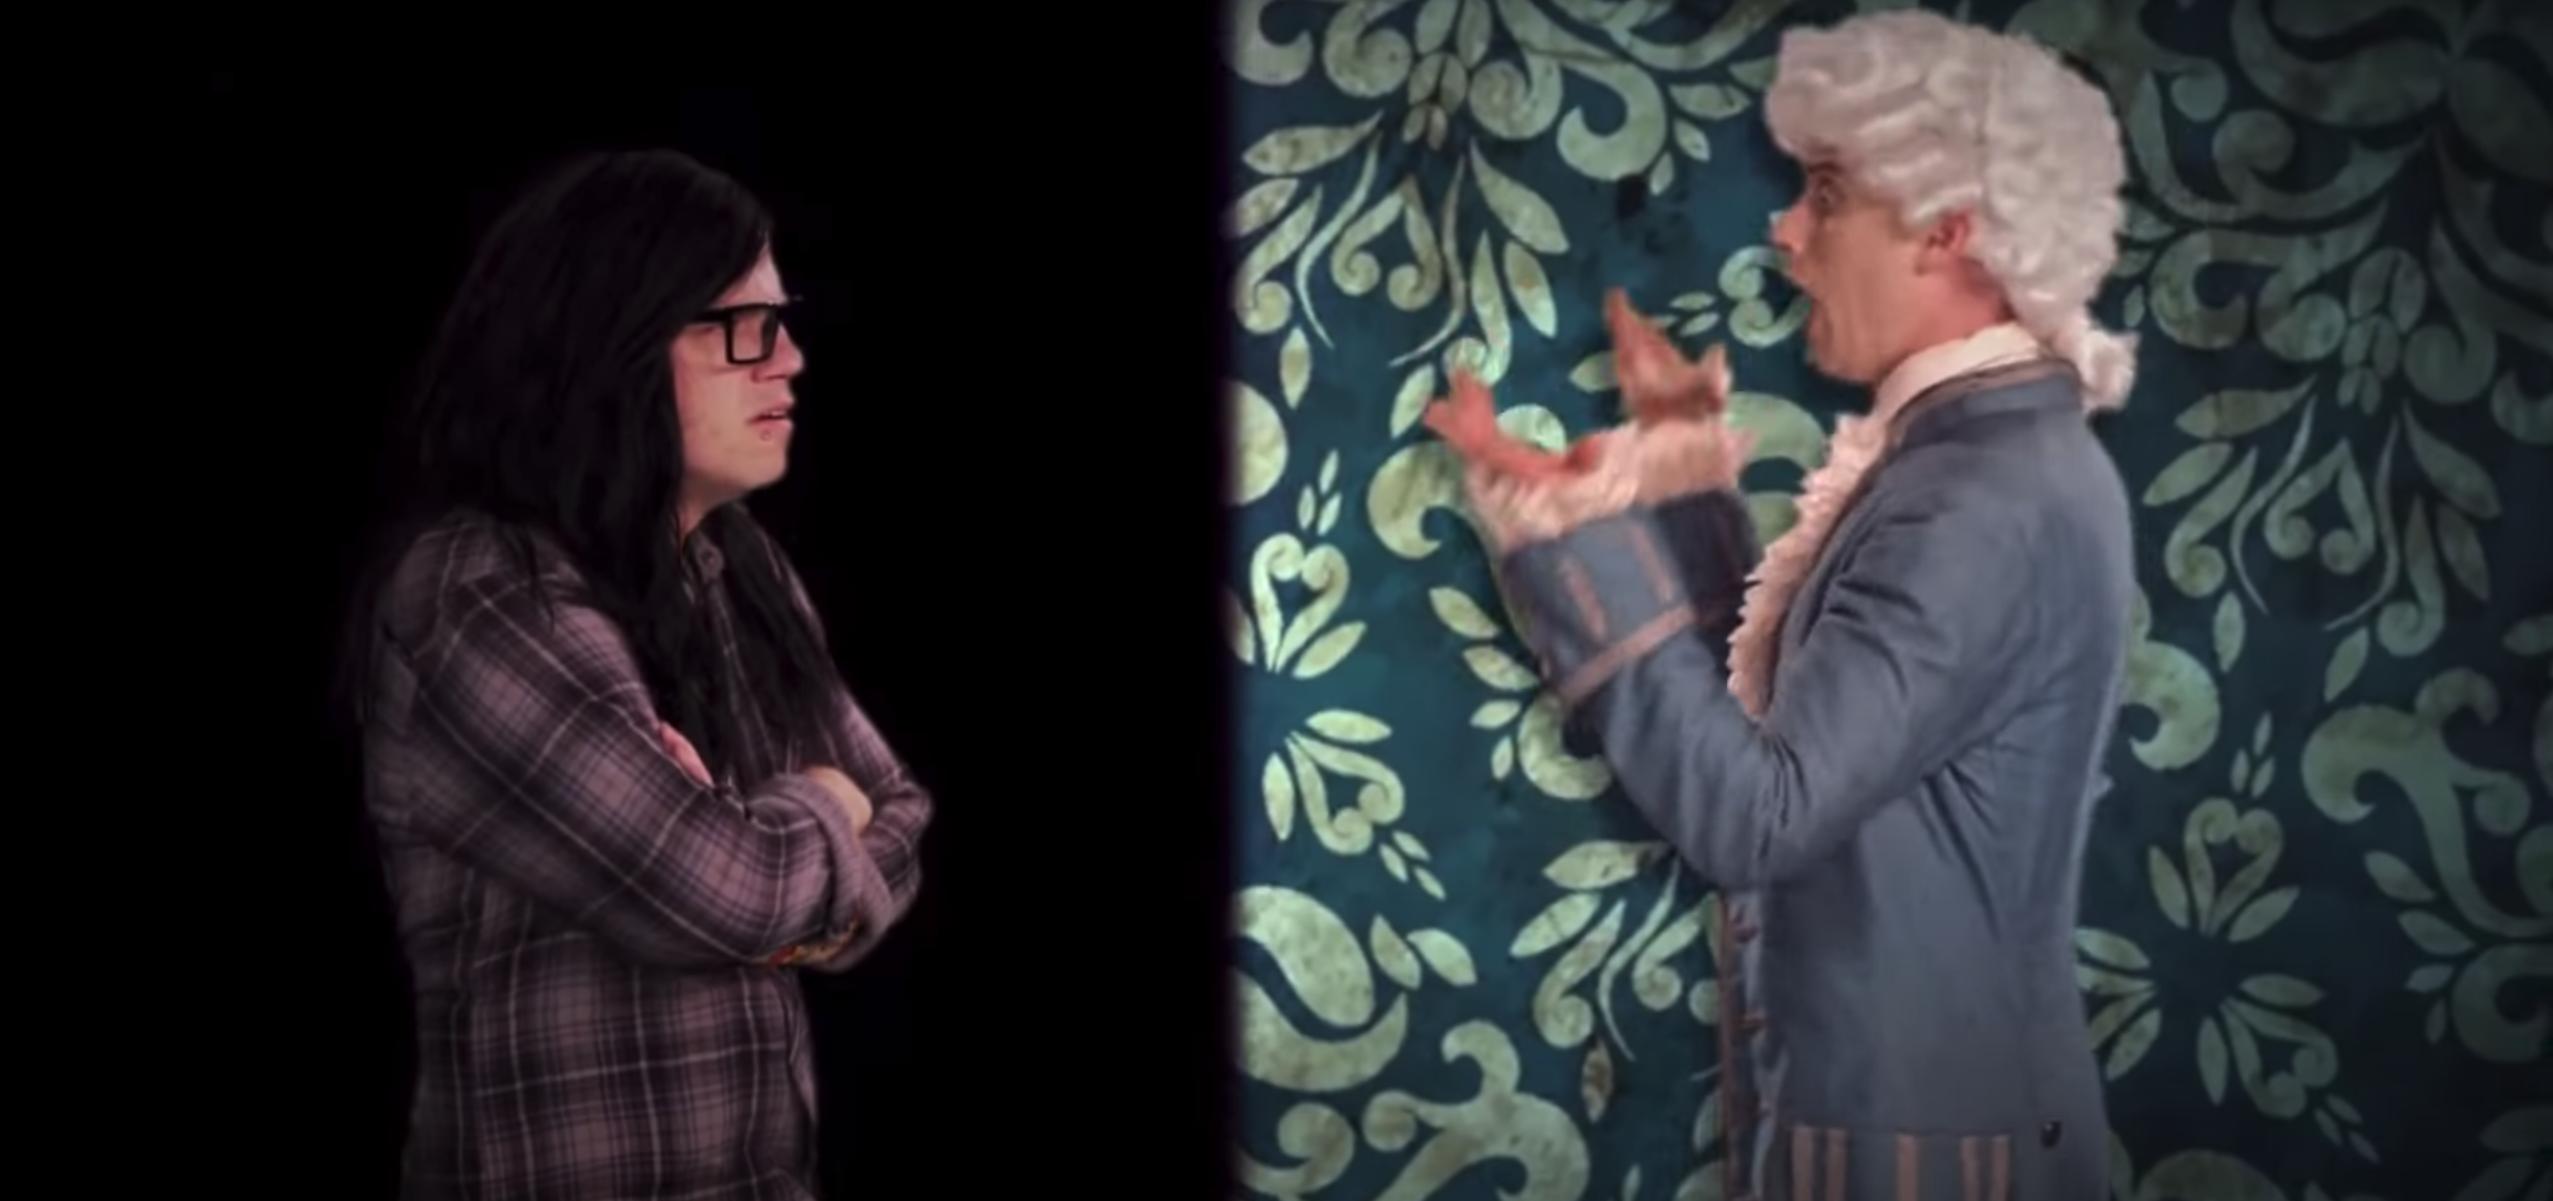 Skrillex and Mozart battling it out via rap